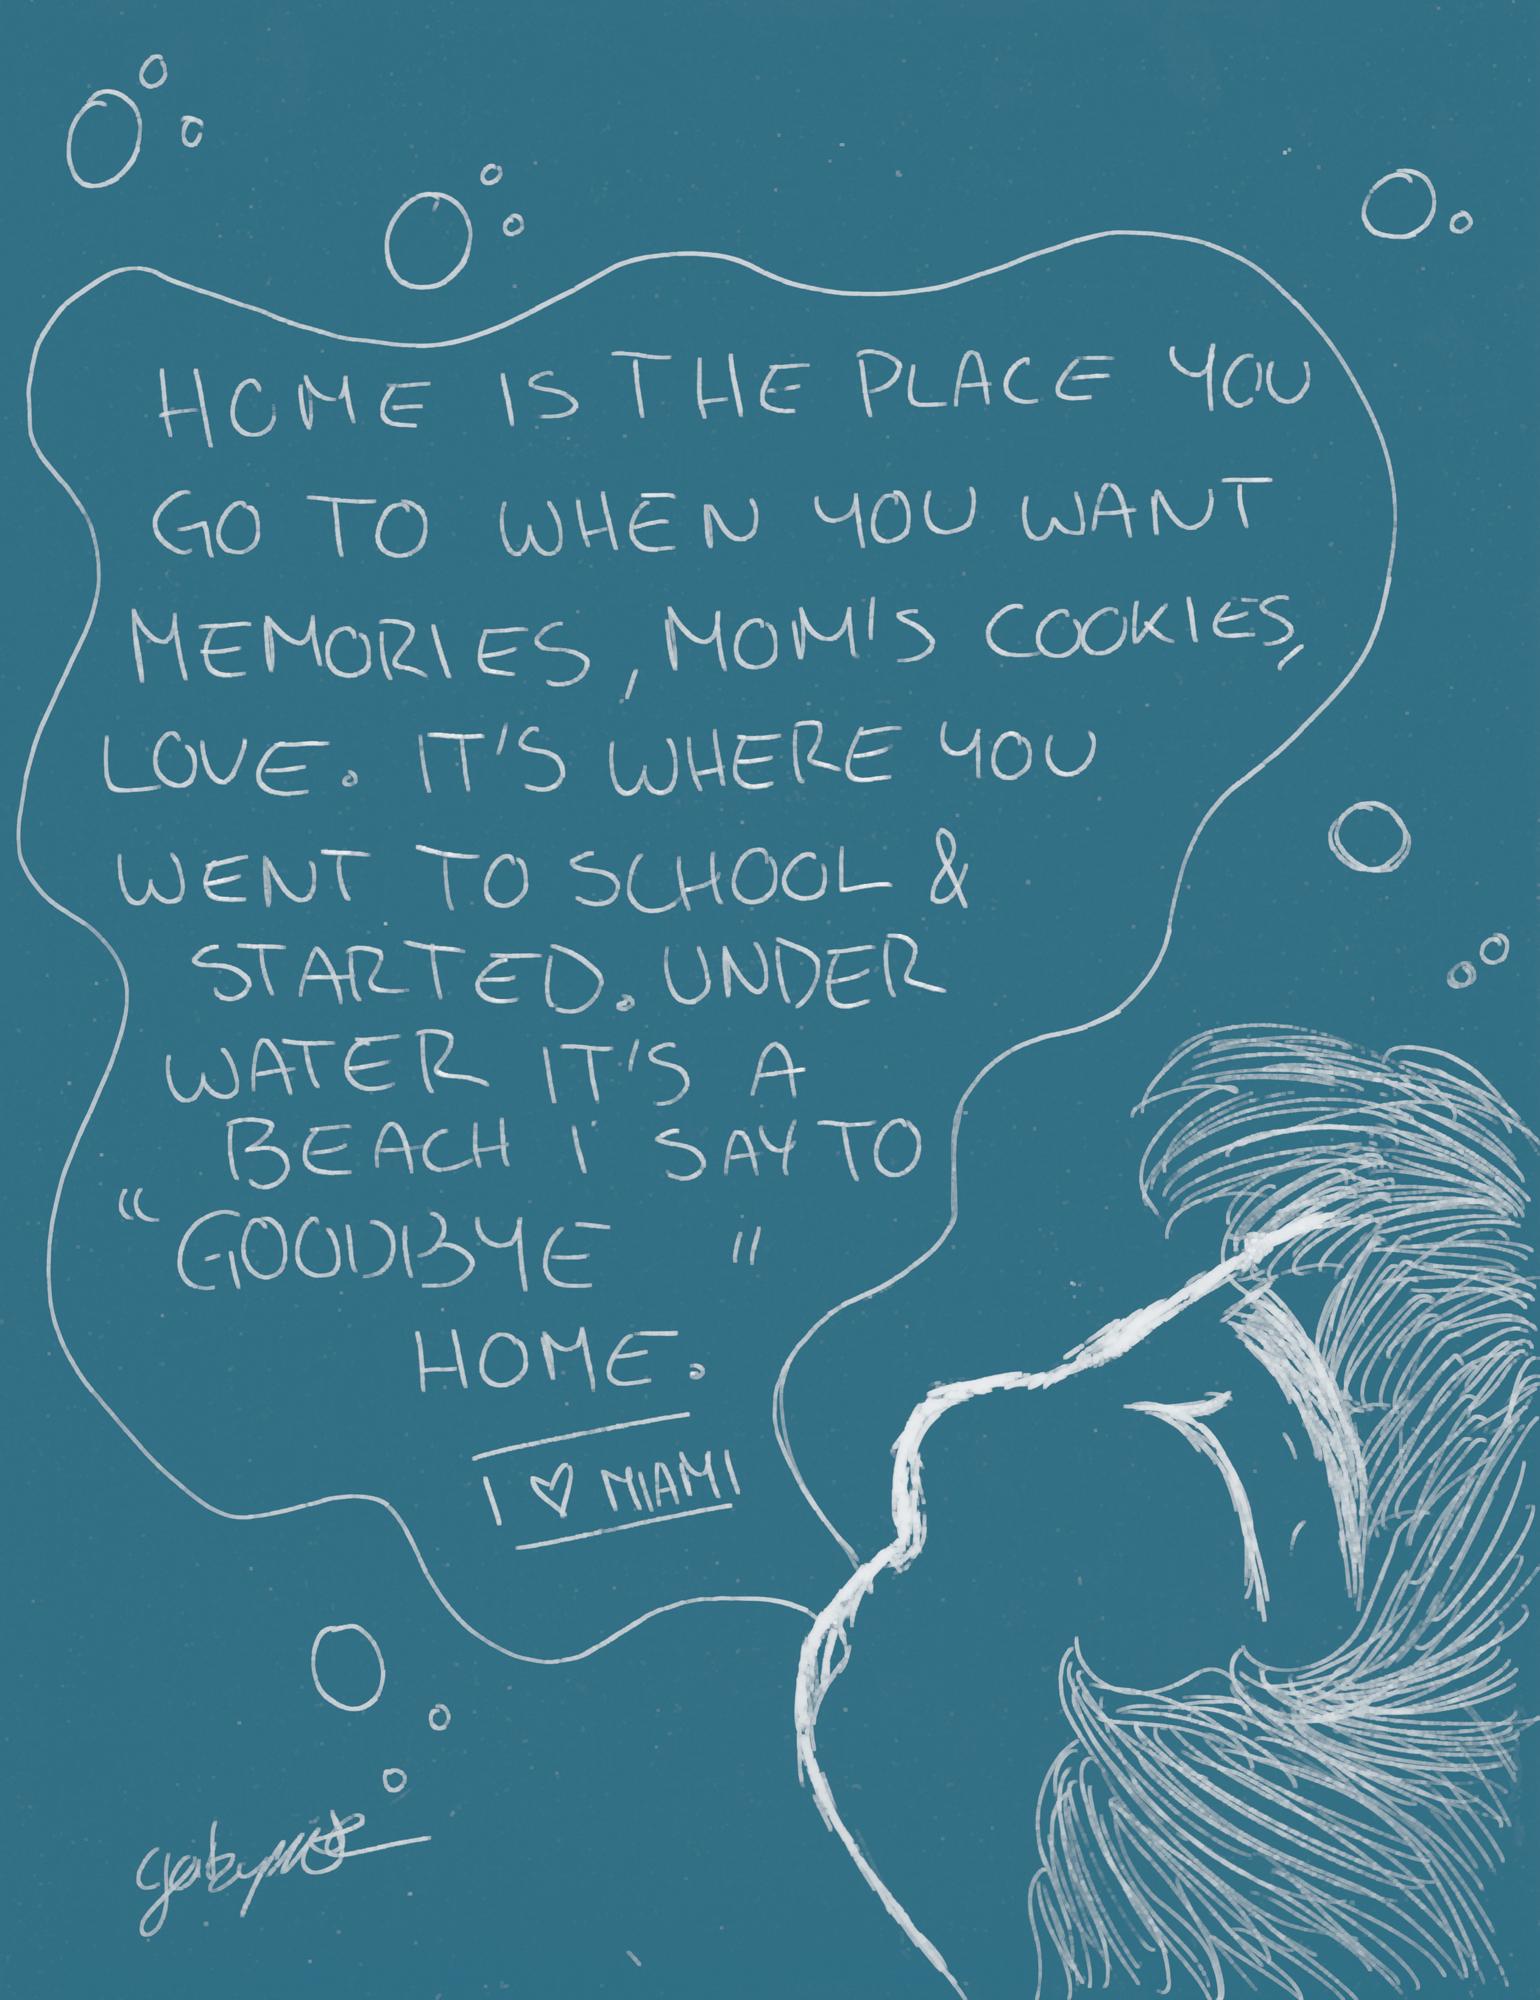 goodbye home.jpg